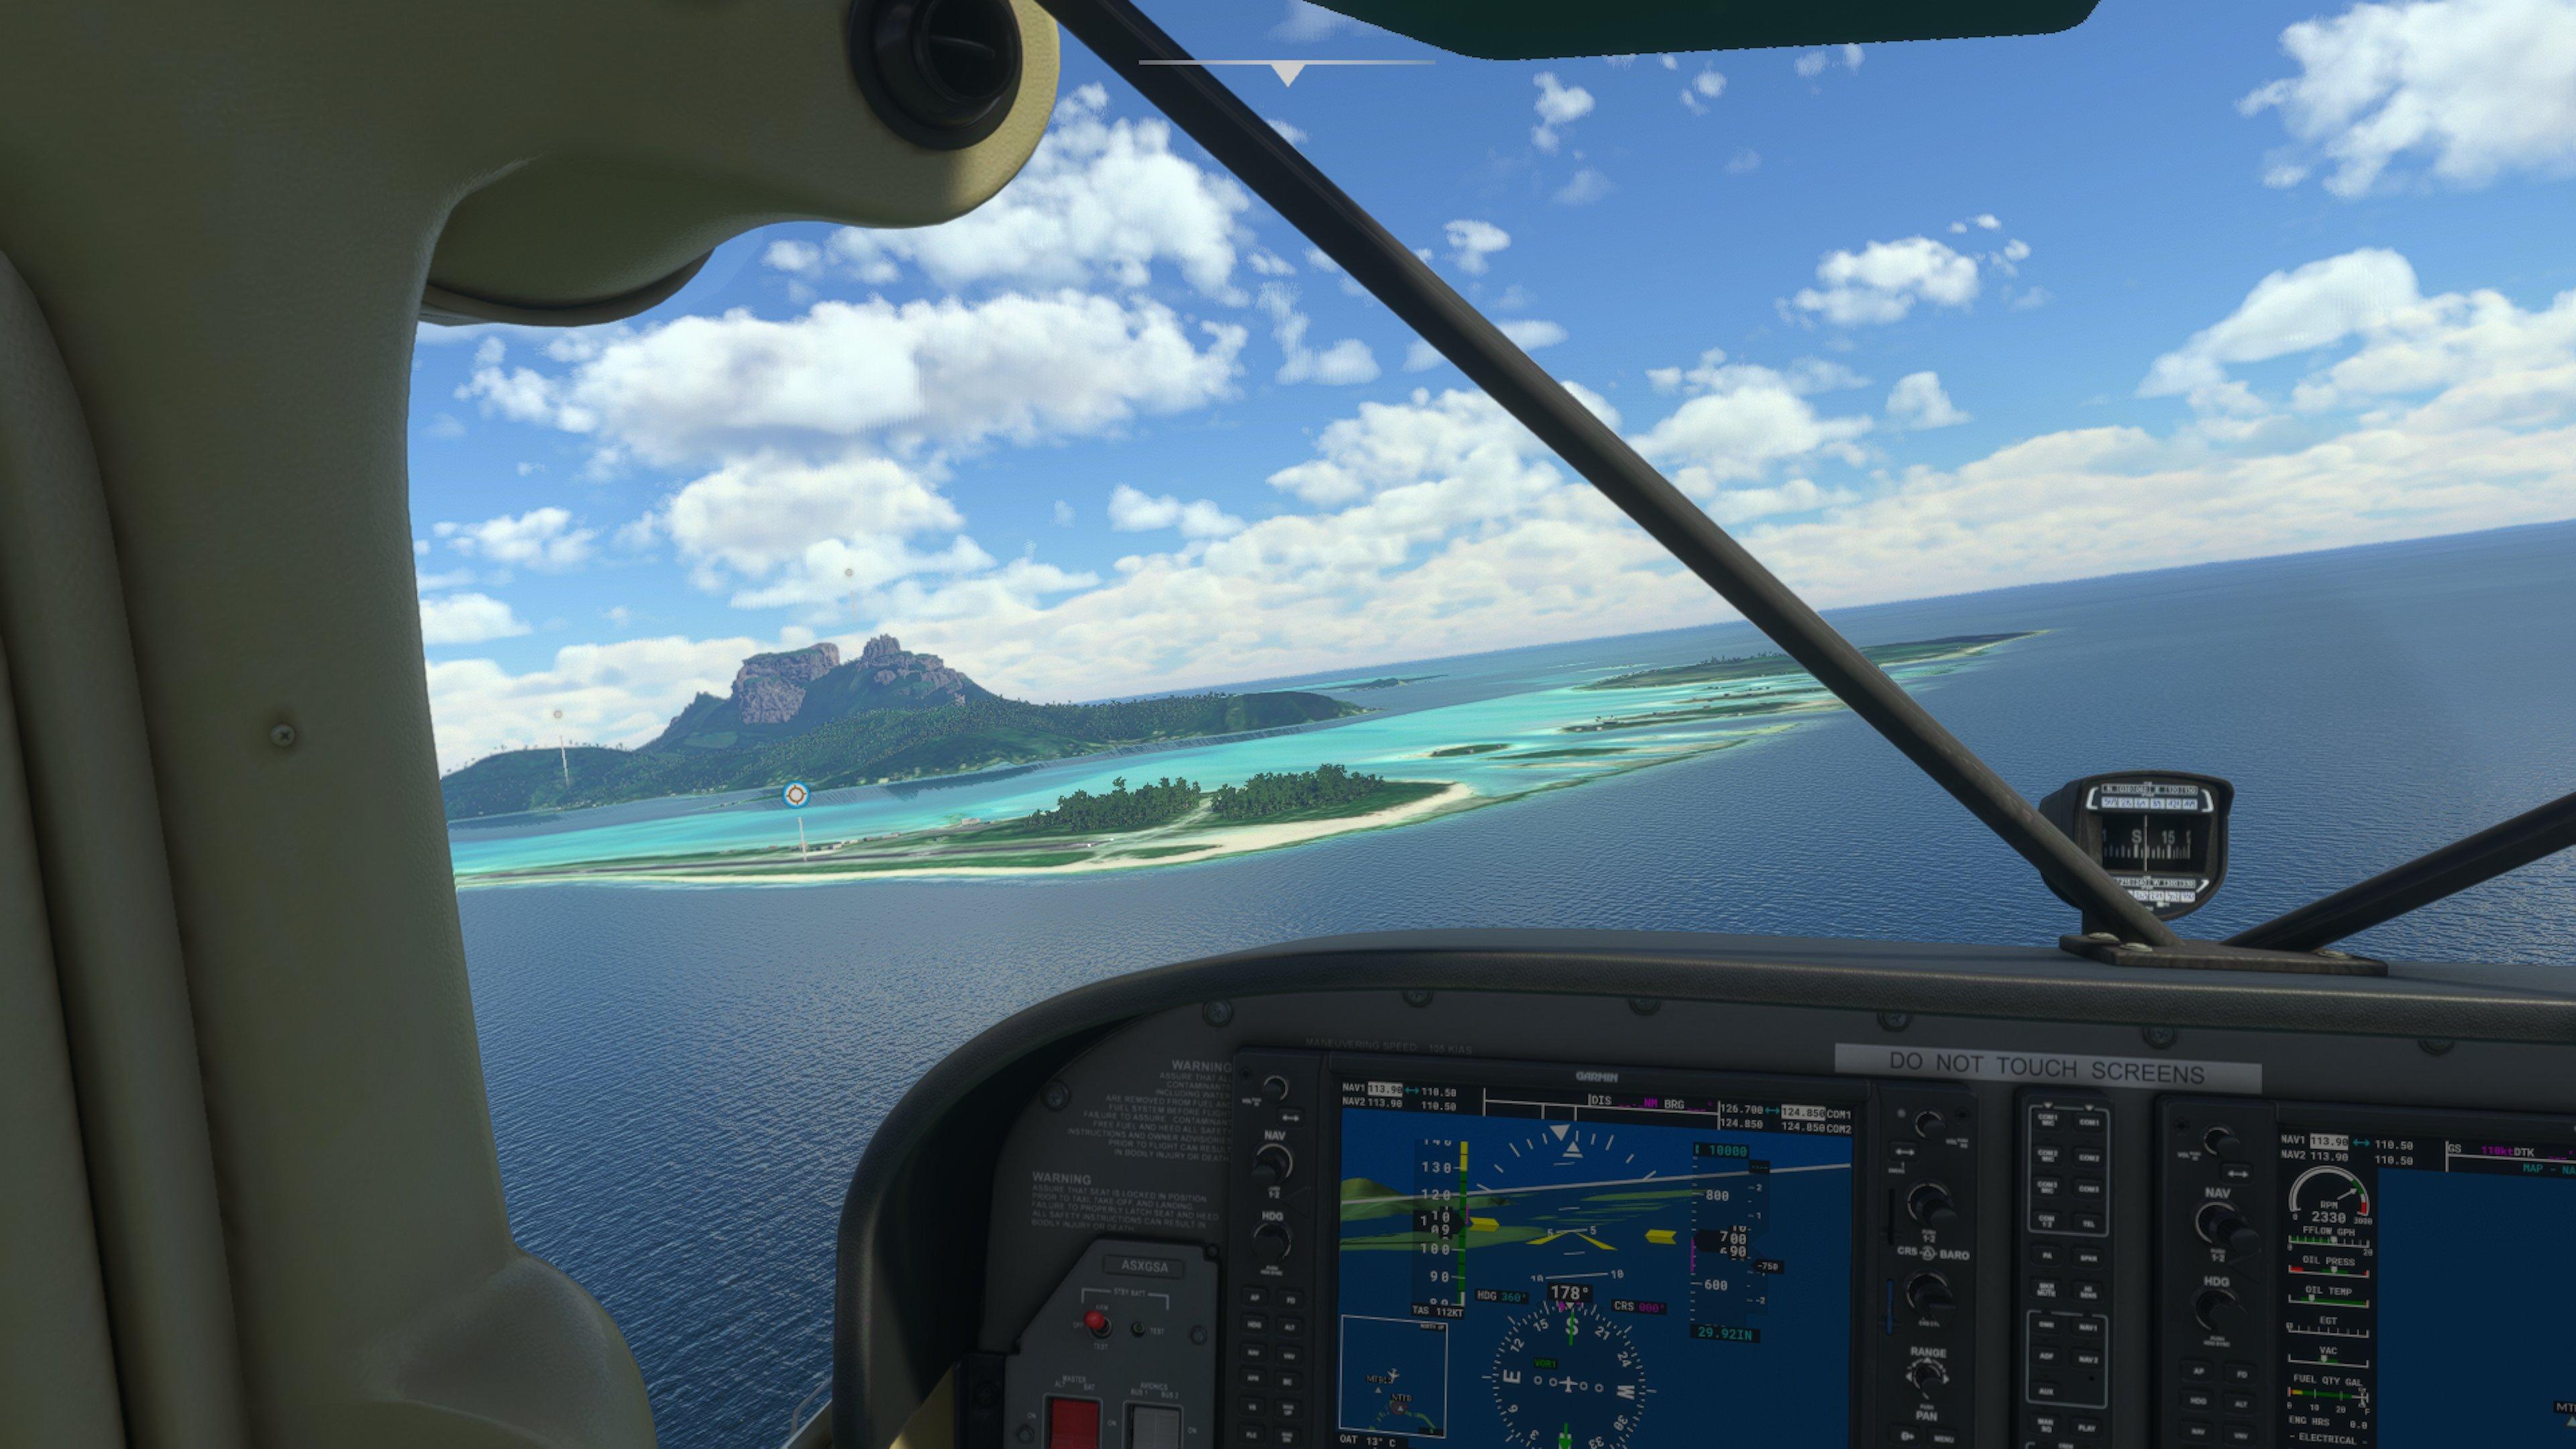 Впечатления от полетов в Microsoft Flight Simulator на Xbox Series X